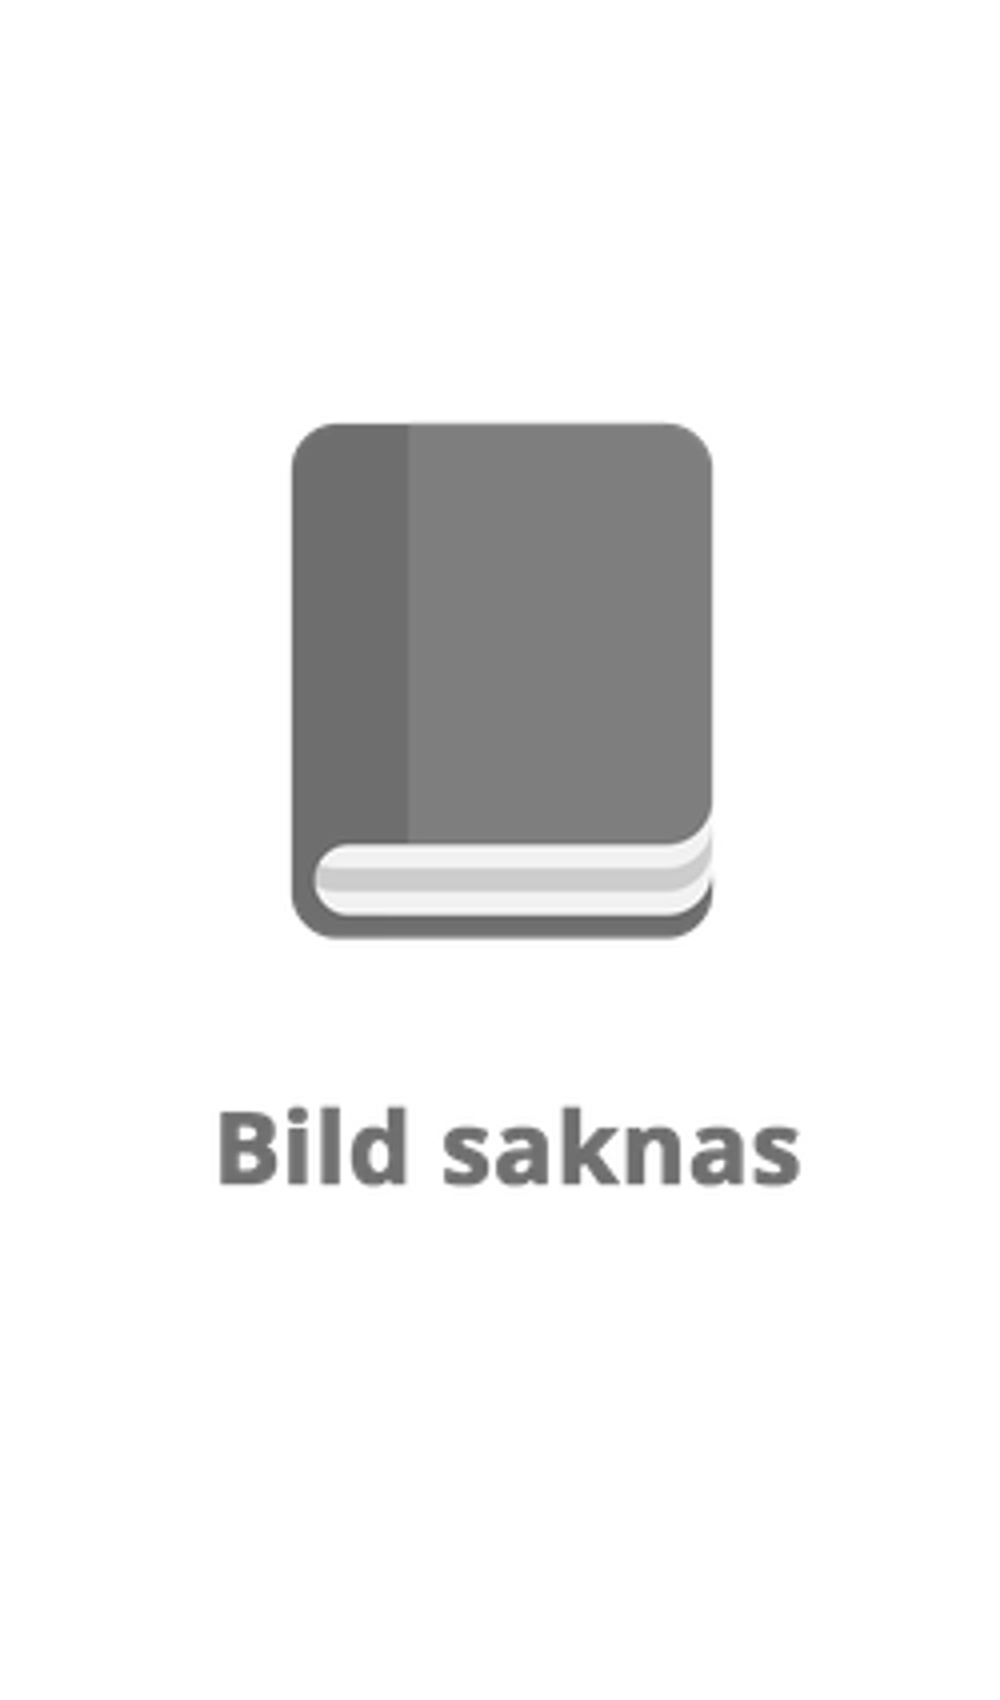 Selime - utan skyddsnät